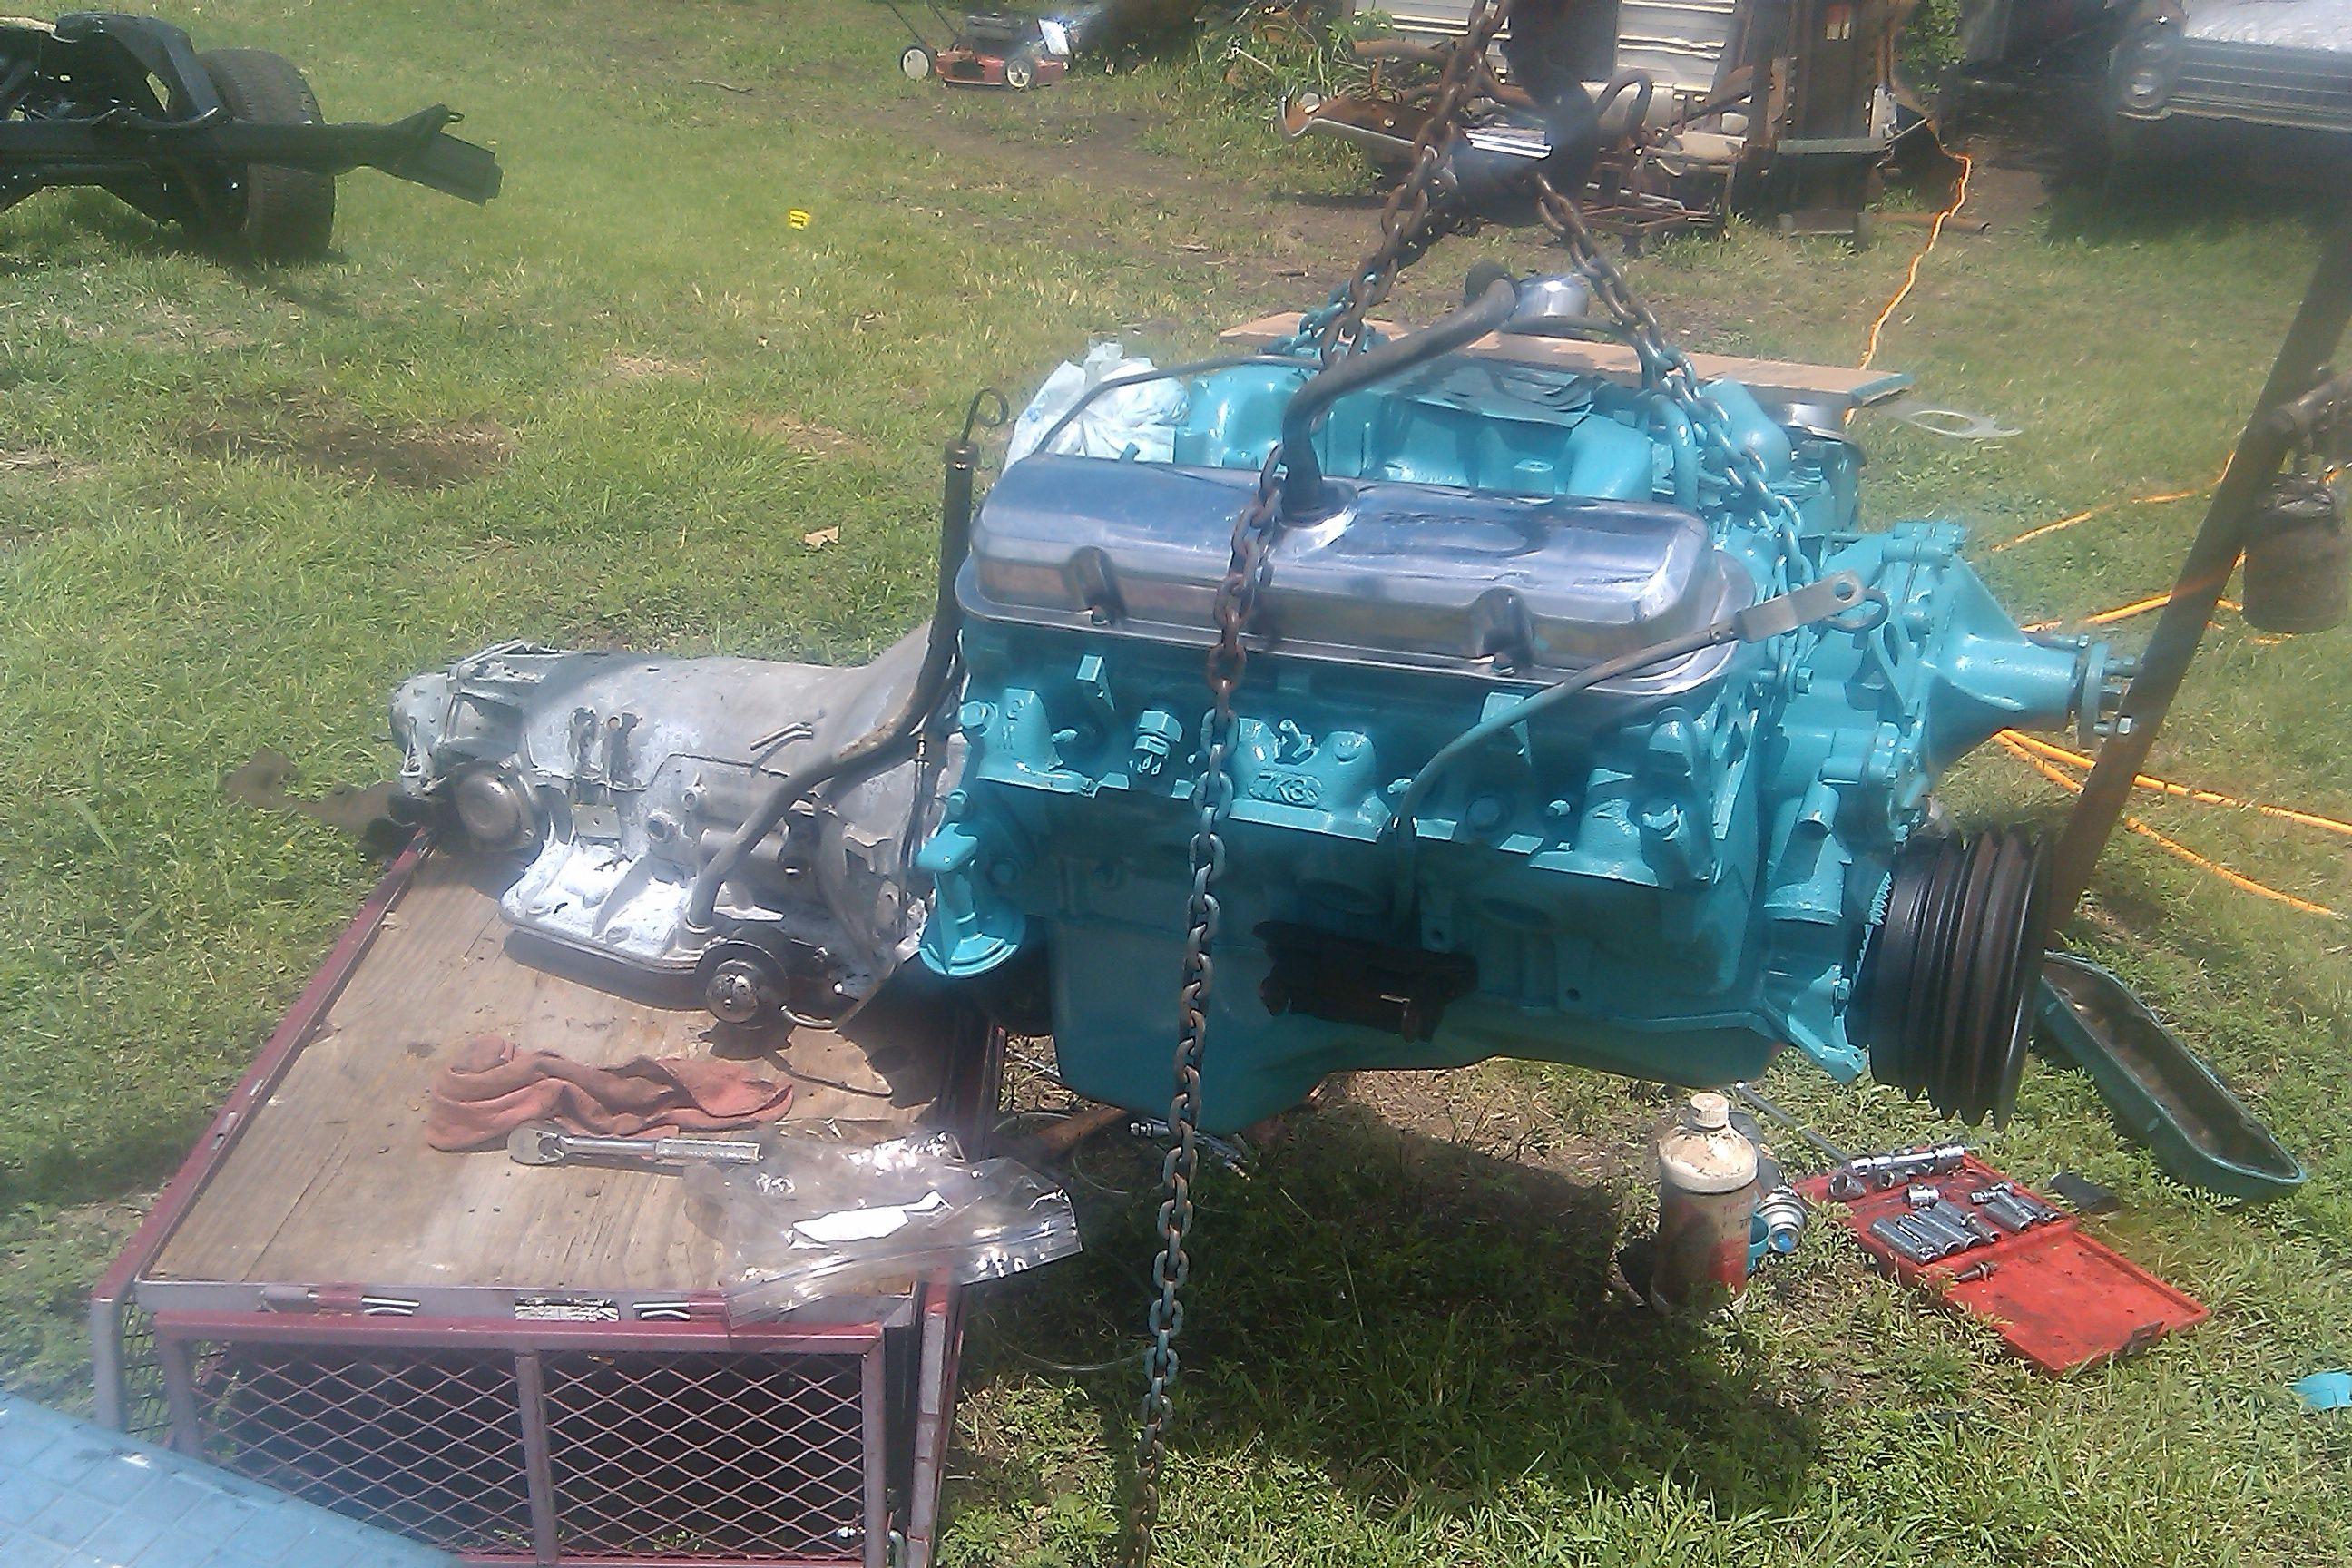 400 Pontiac engine and trans  | My 65 Pontiac project